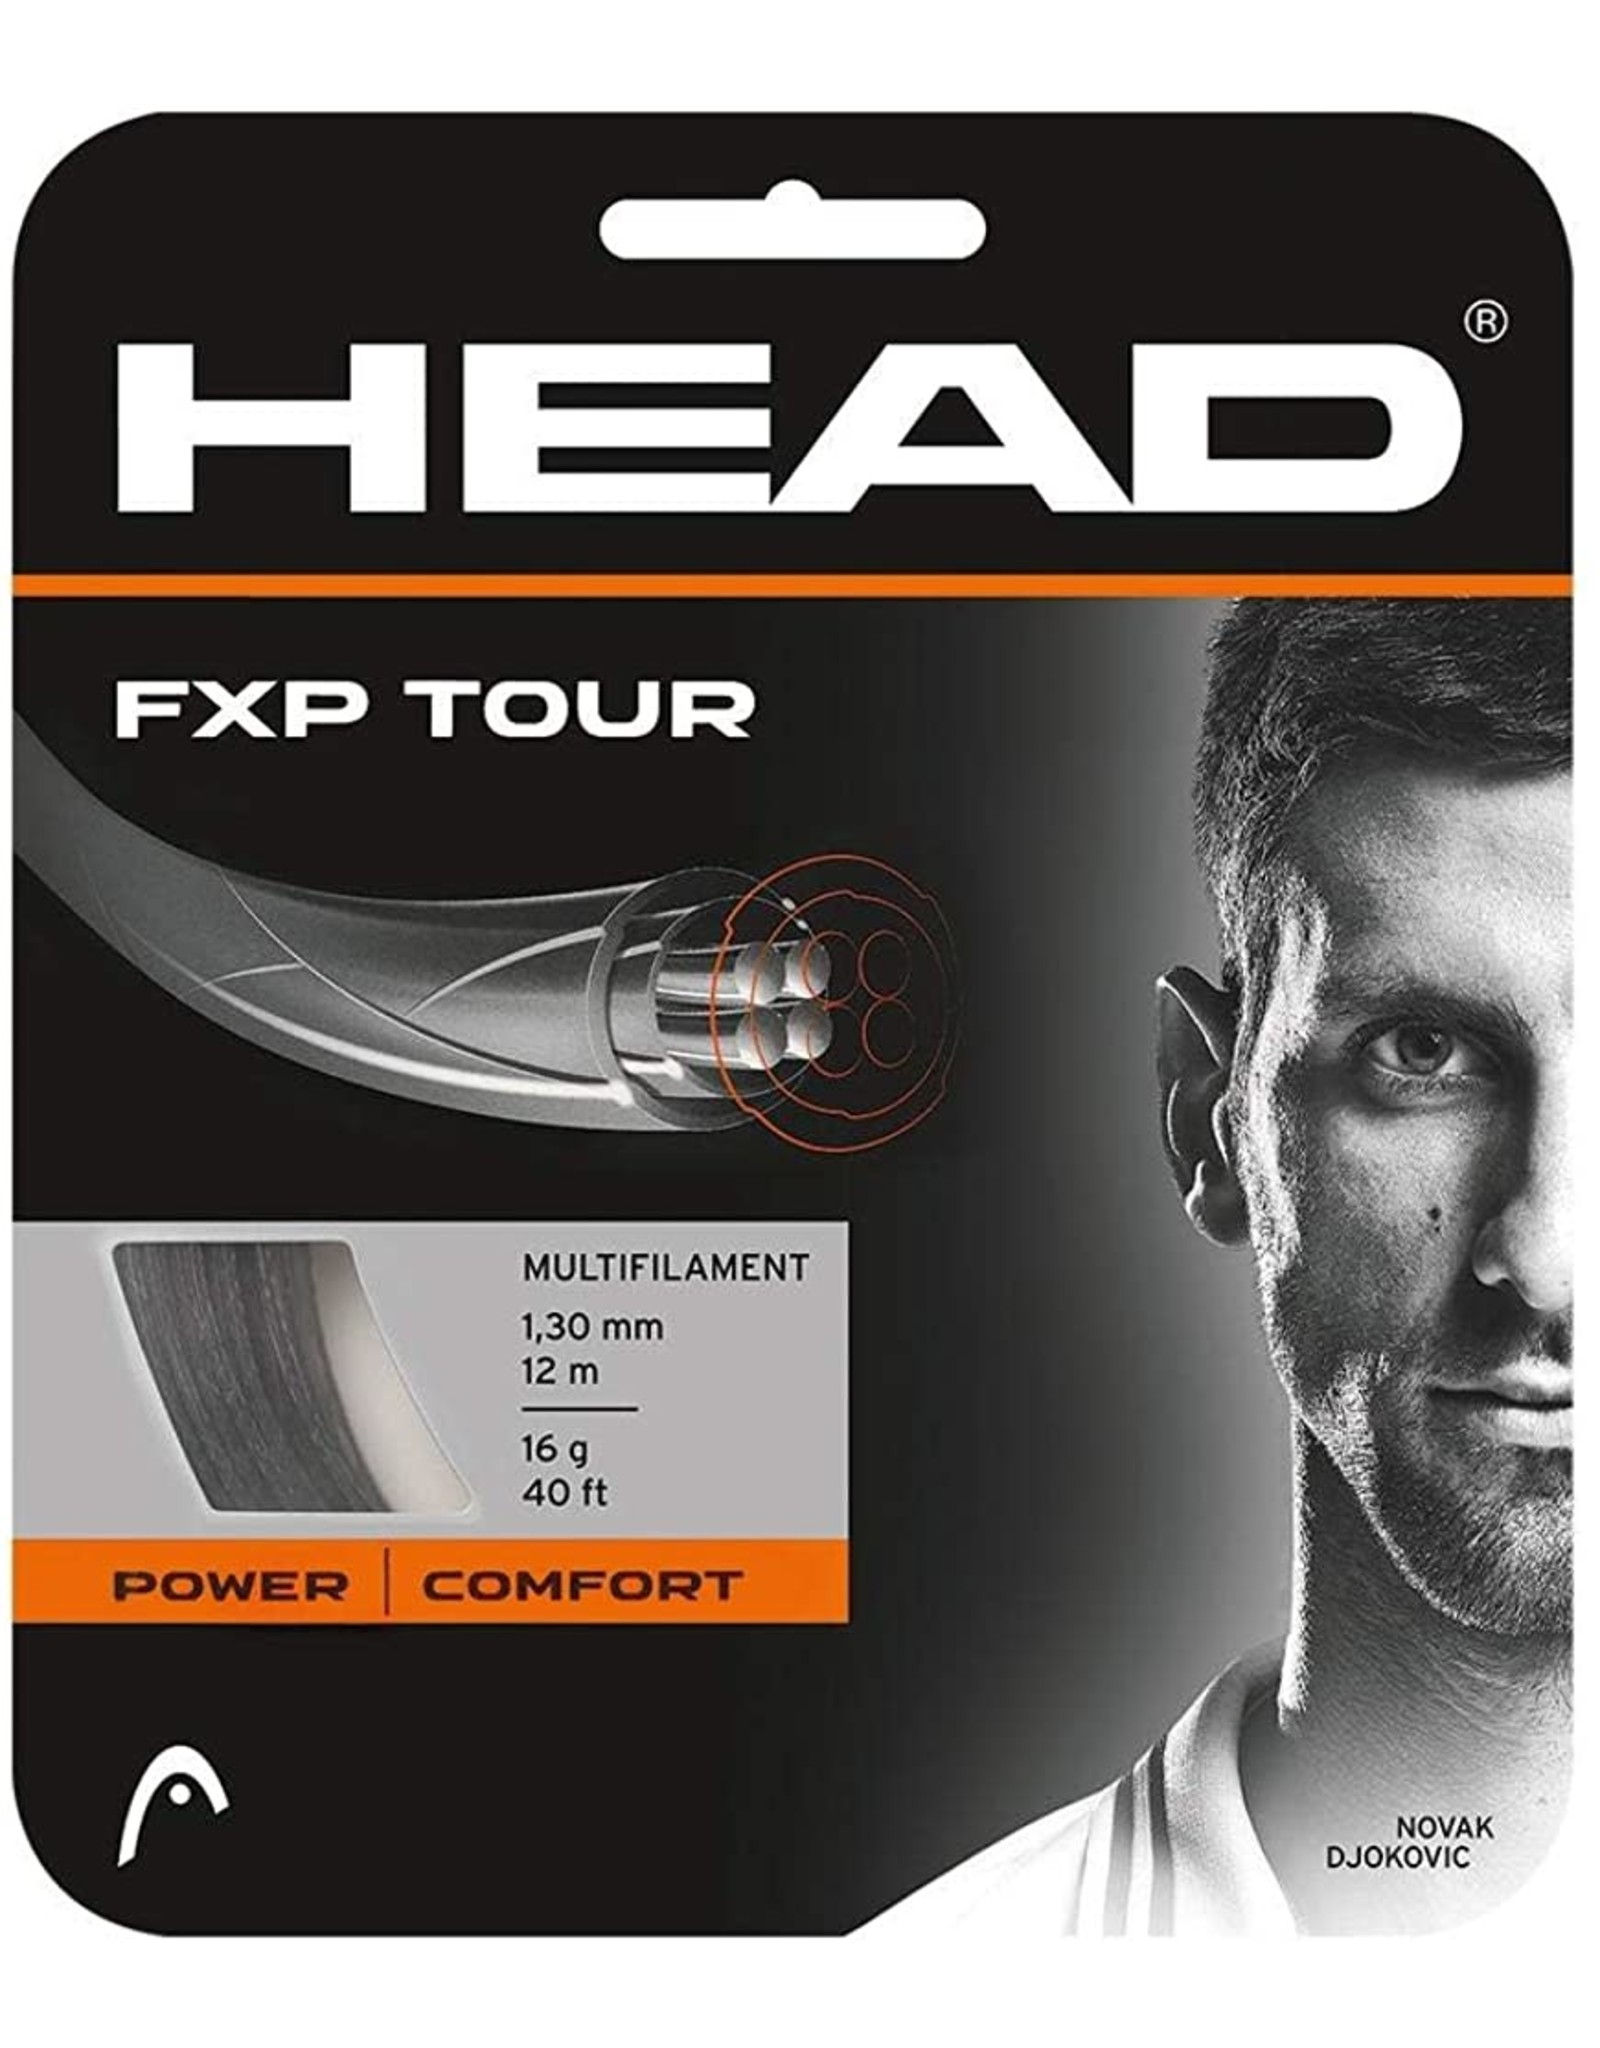 Head Head FXP Tour string